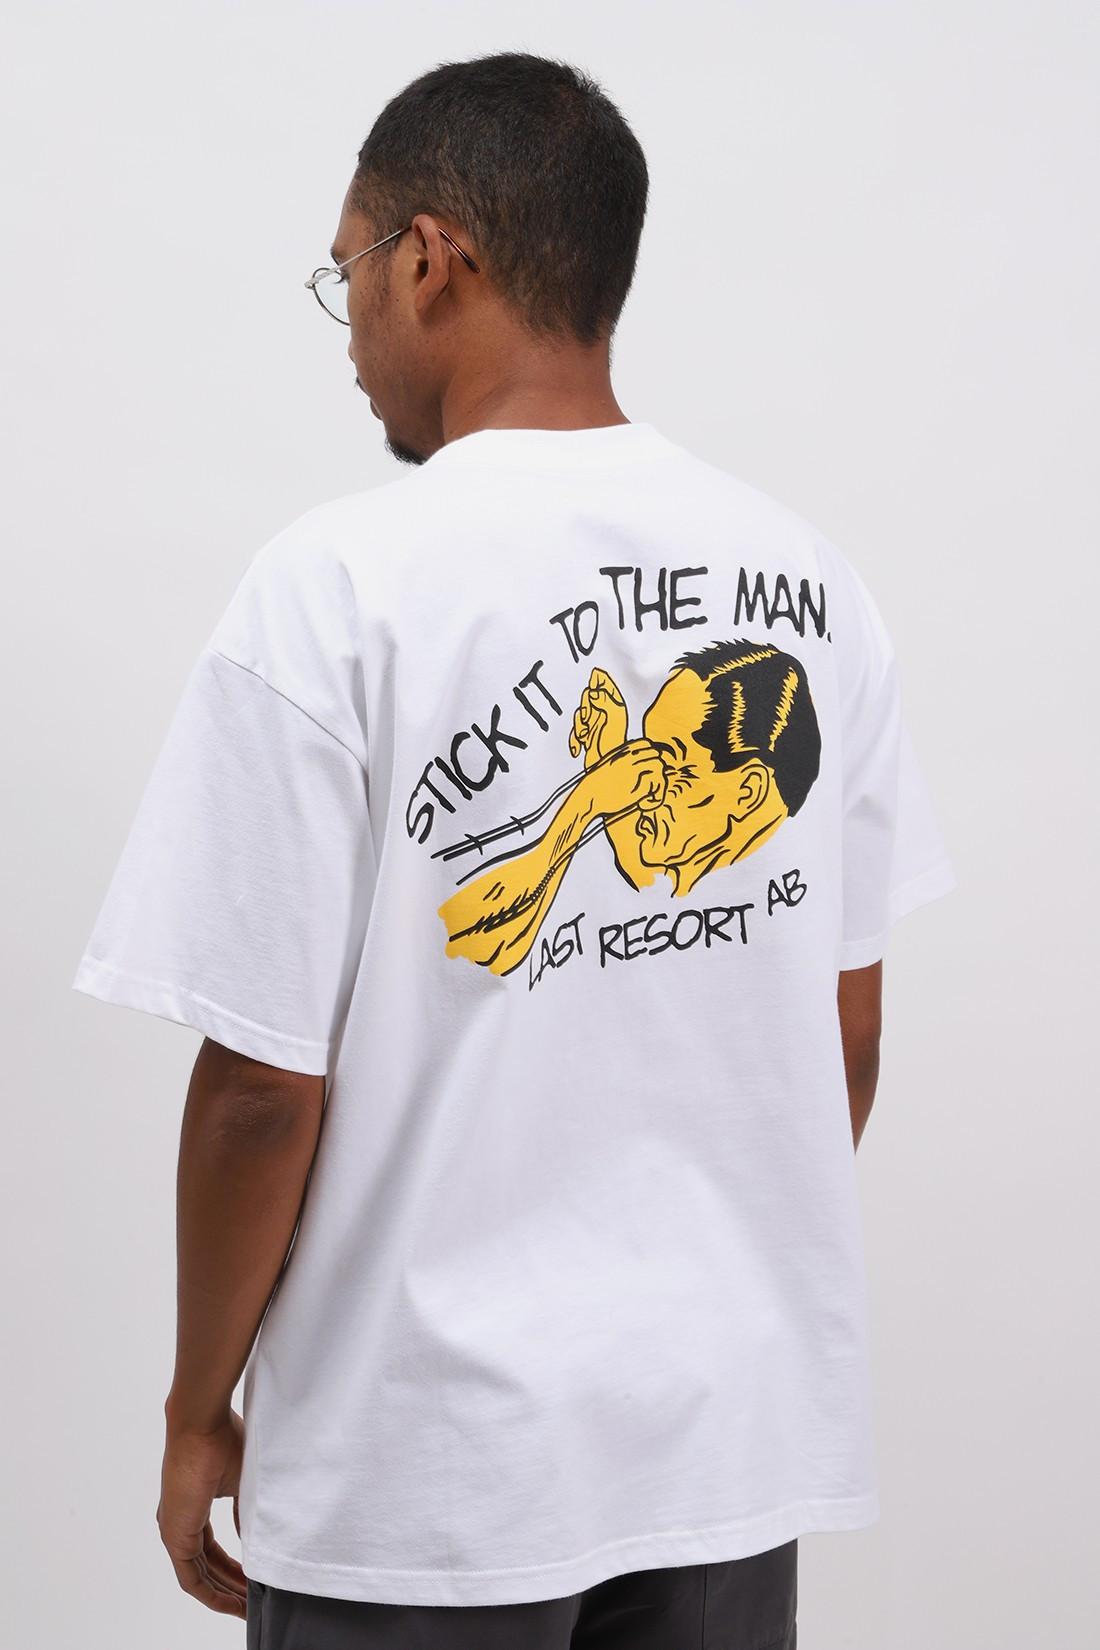 LAST RESORT AB / Stick it tee White